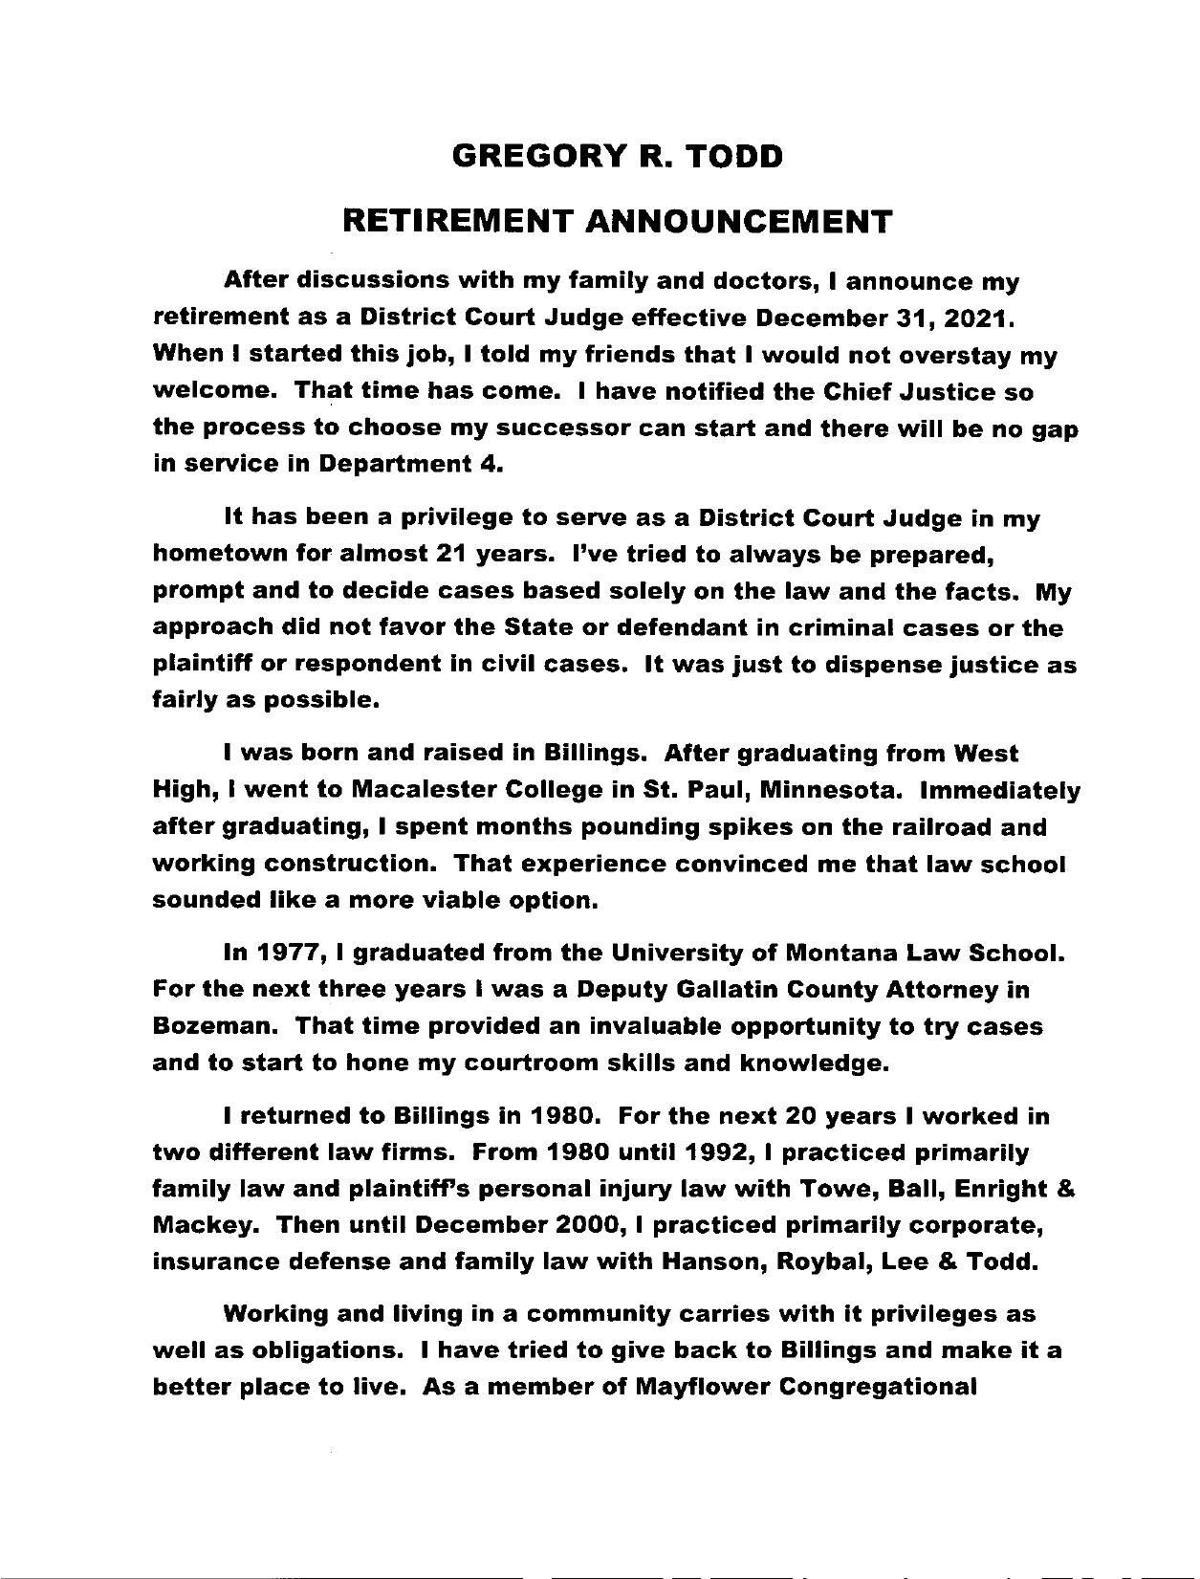 Judge Todd Retirement Announcement